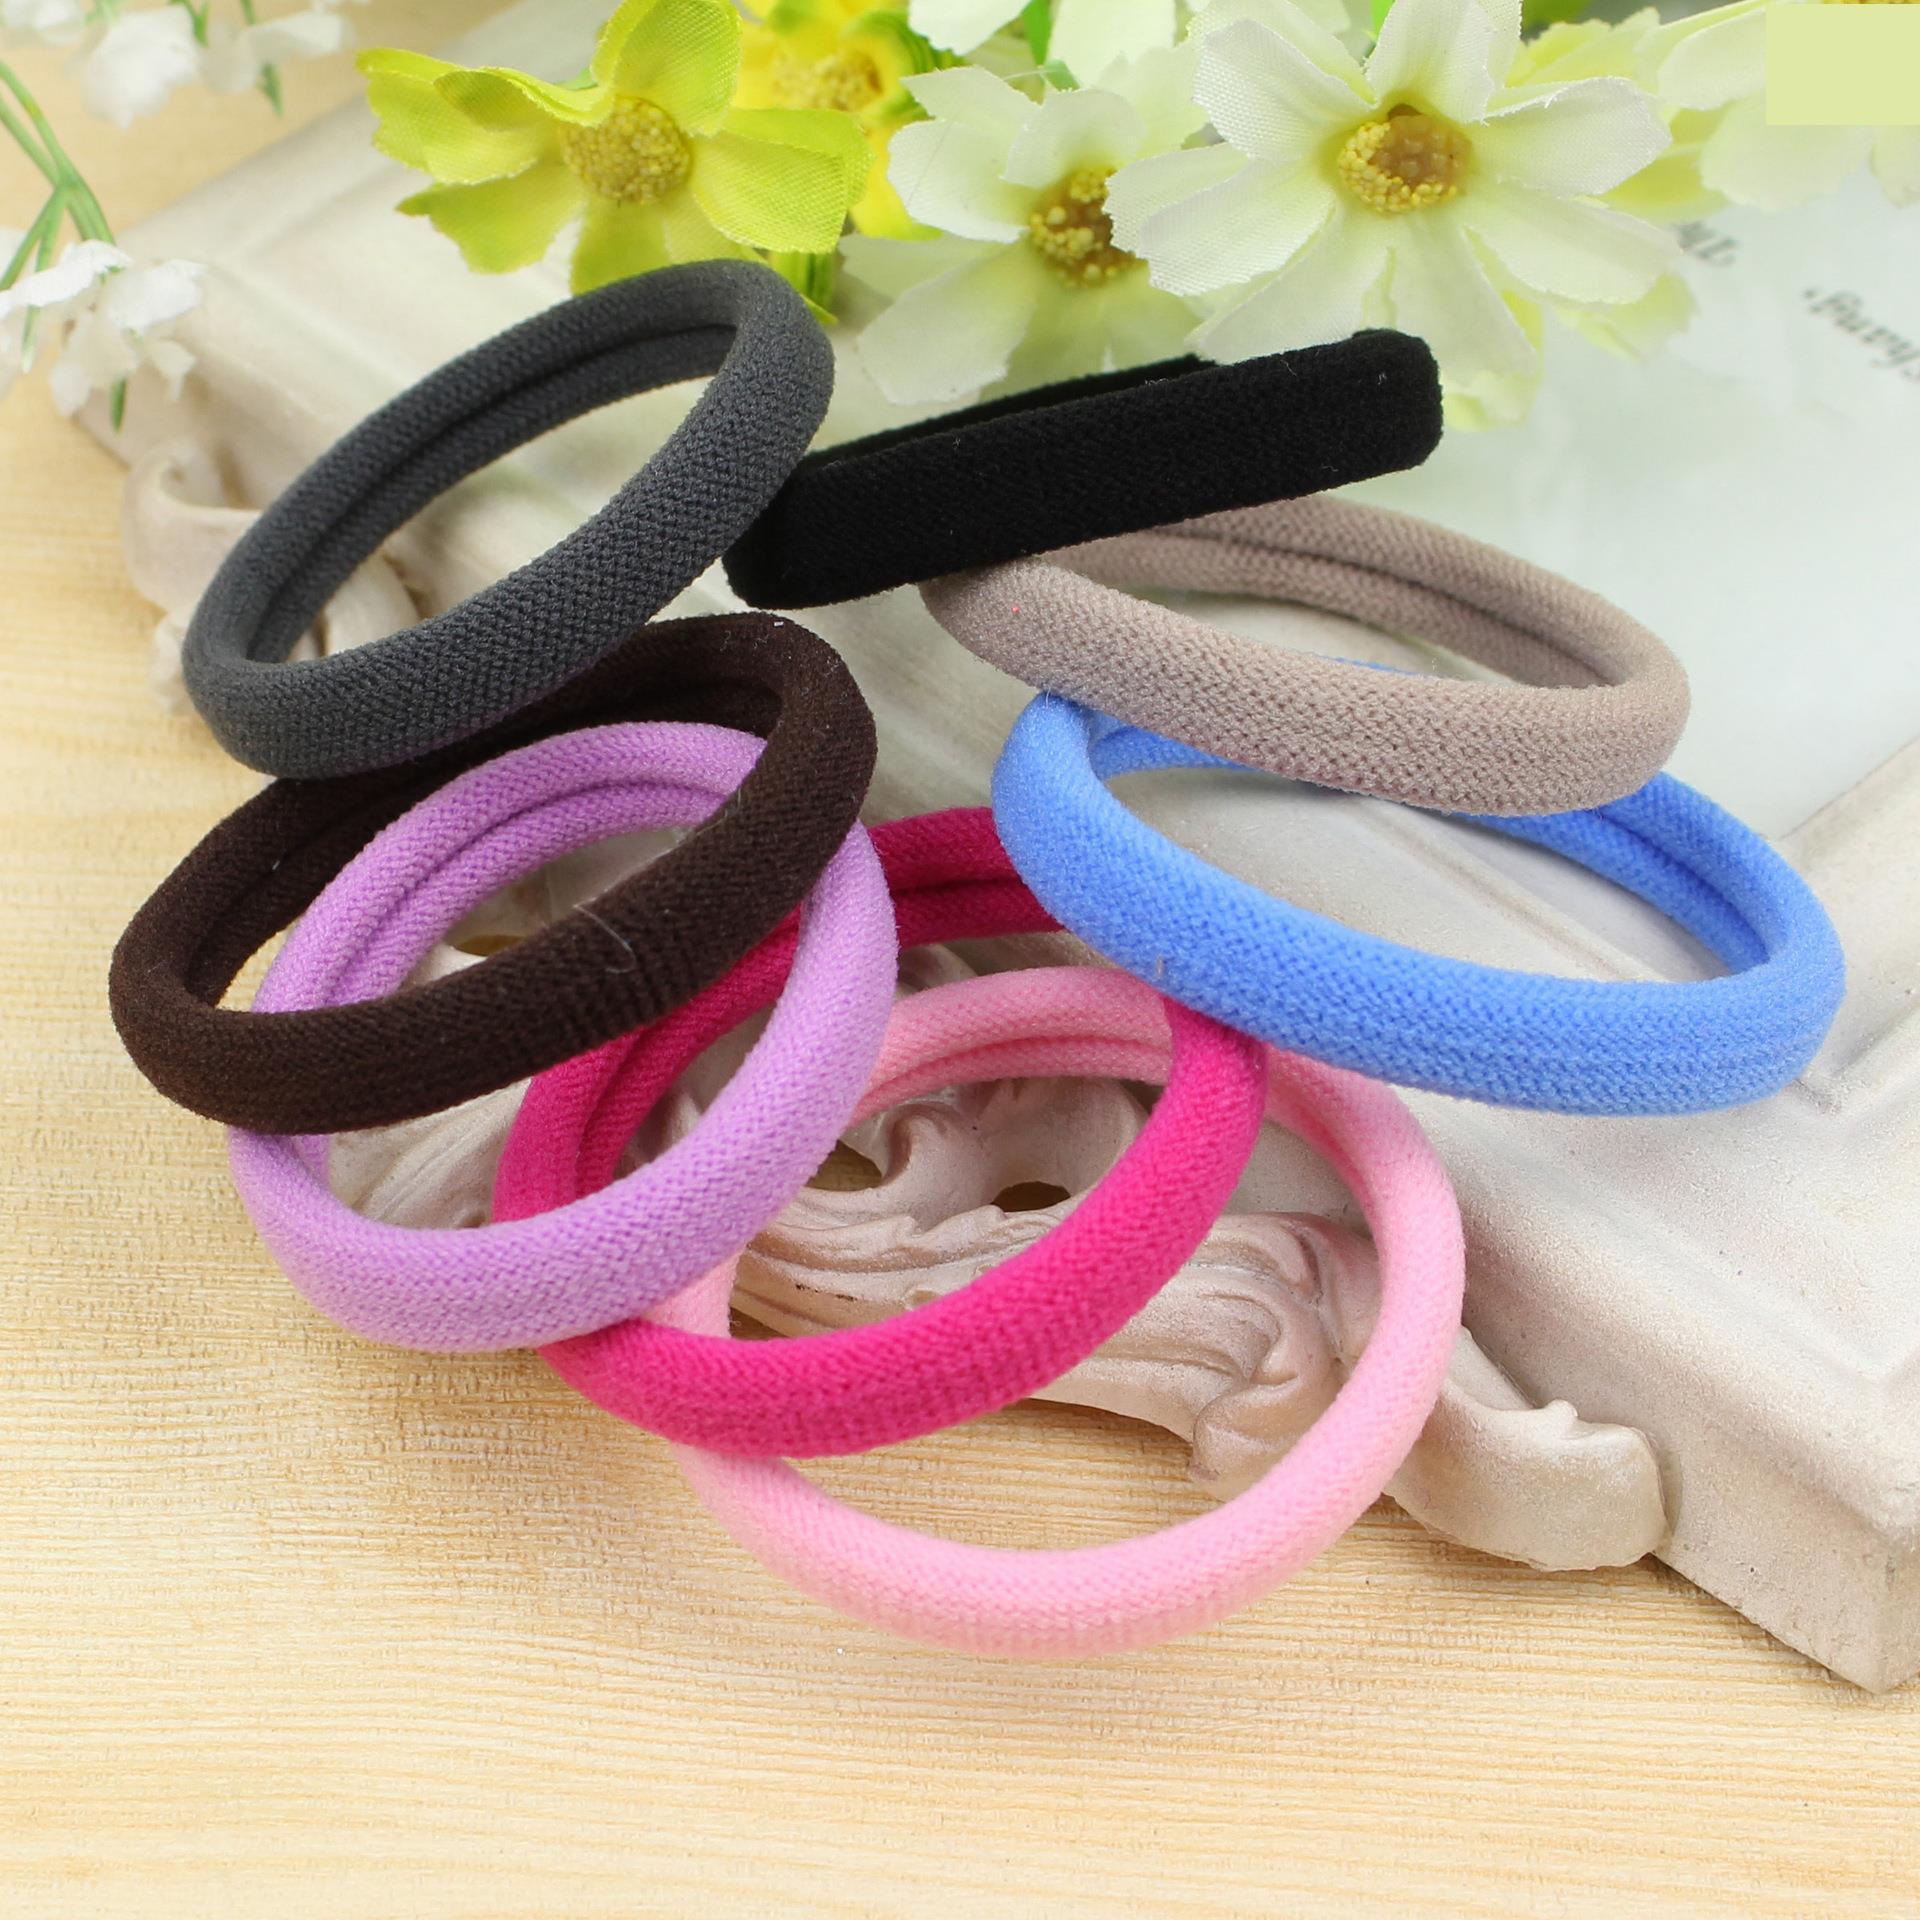 10Pc Hair Scrunchy Rope Elastics Hairbands Tie Headwear Kids Hair Accessories